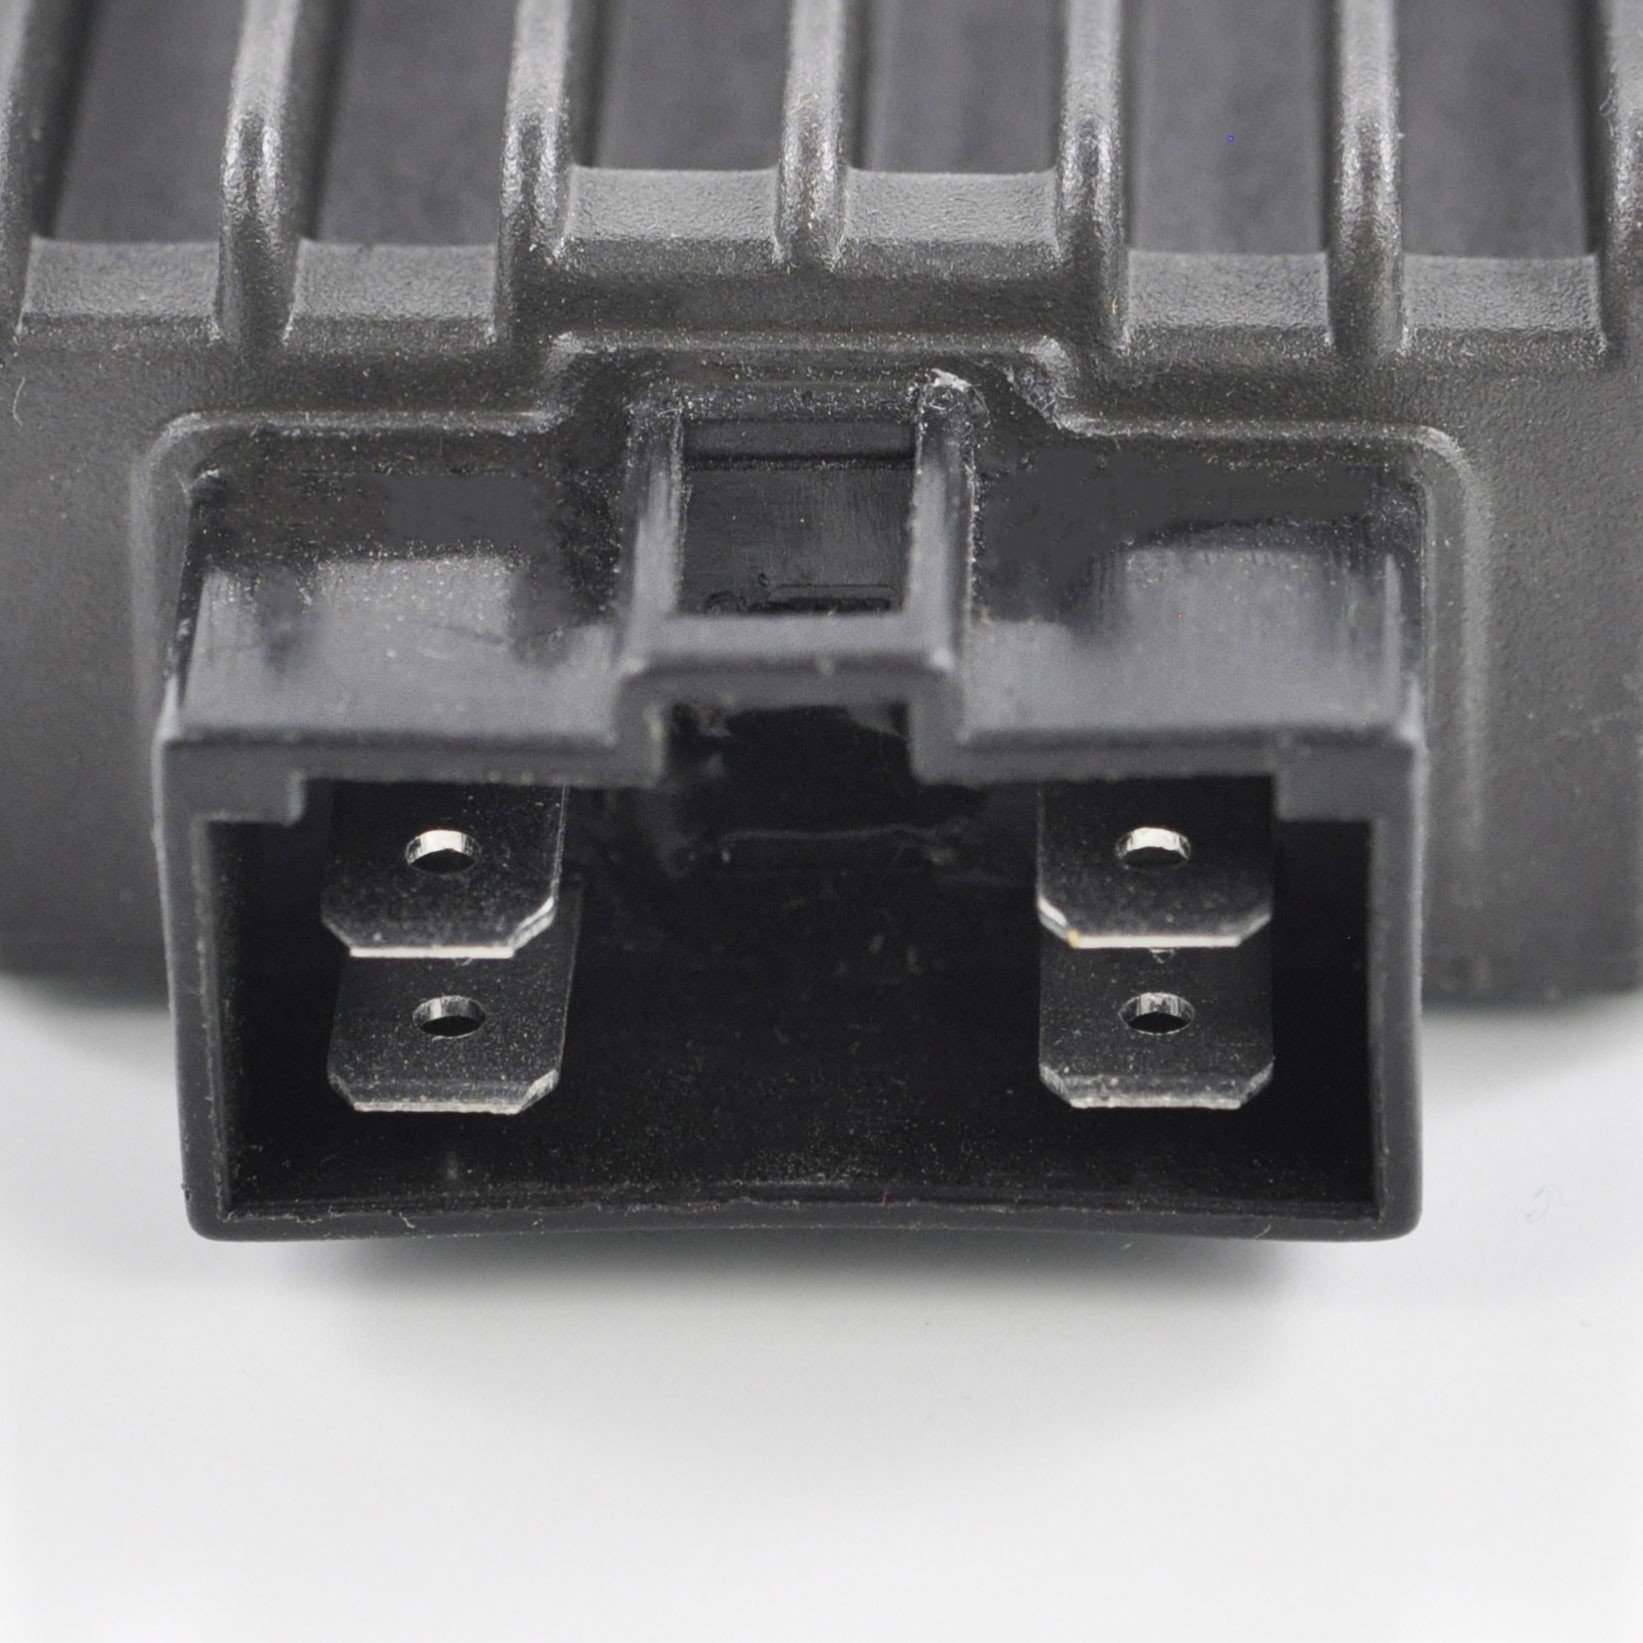 Regulator Rectifier Honda Crf250r Crf450r Crf 250 450 R Wiring